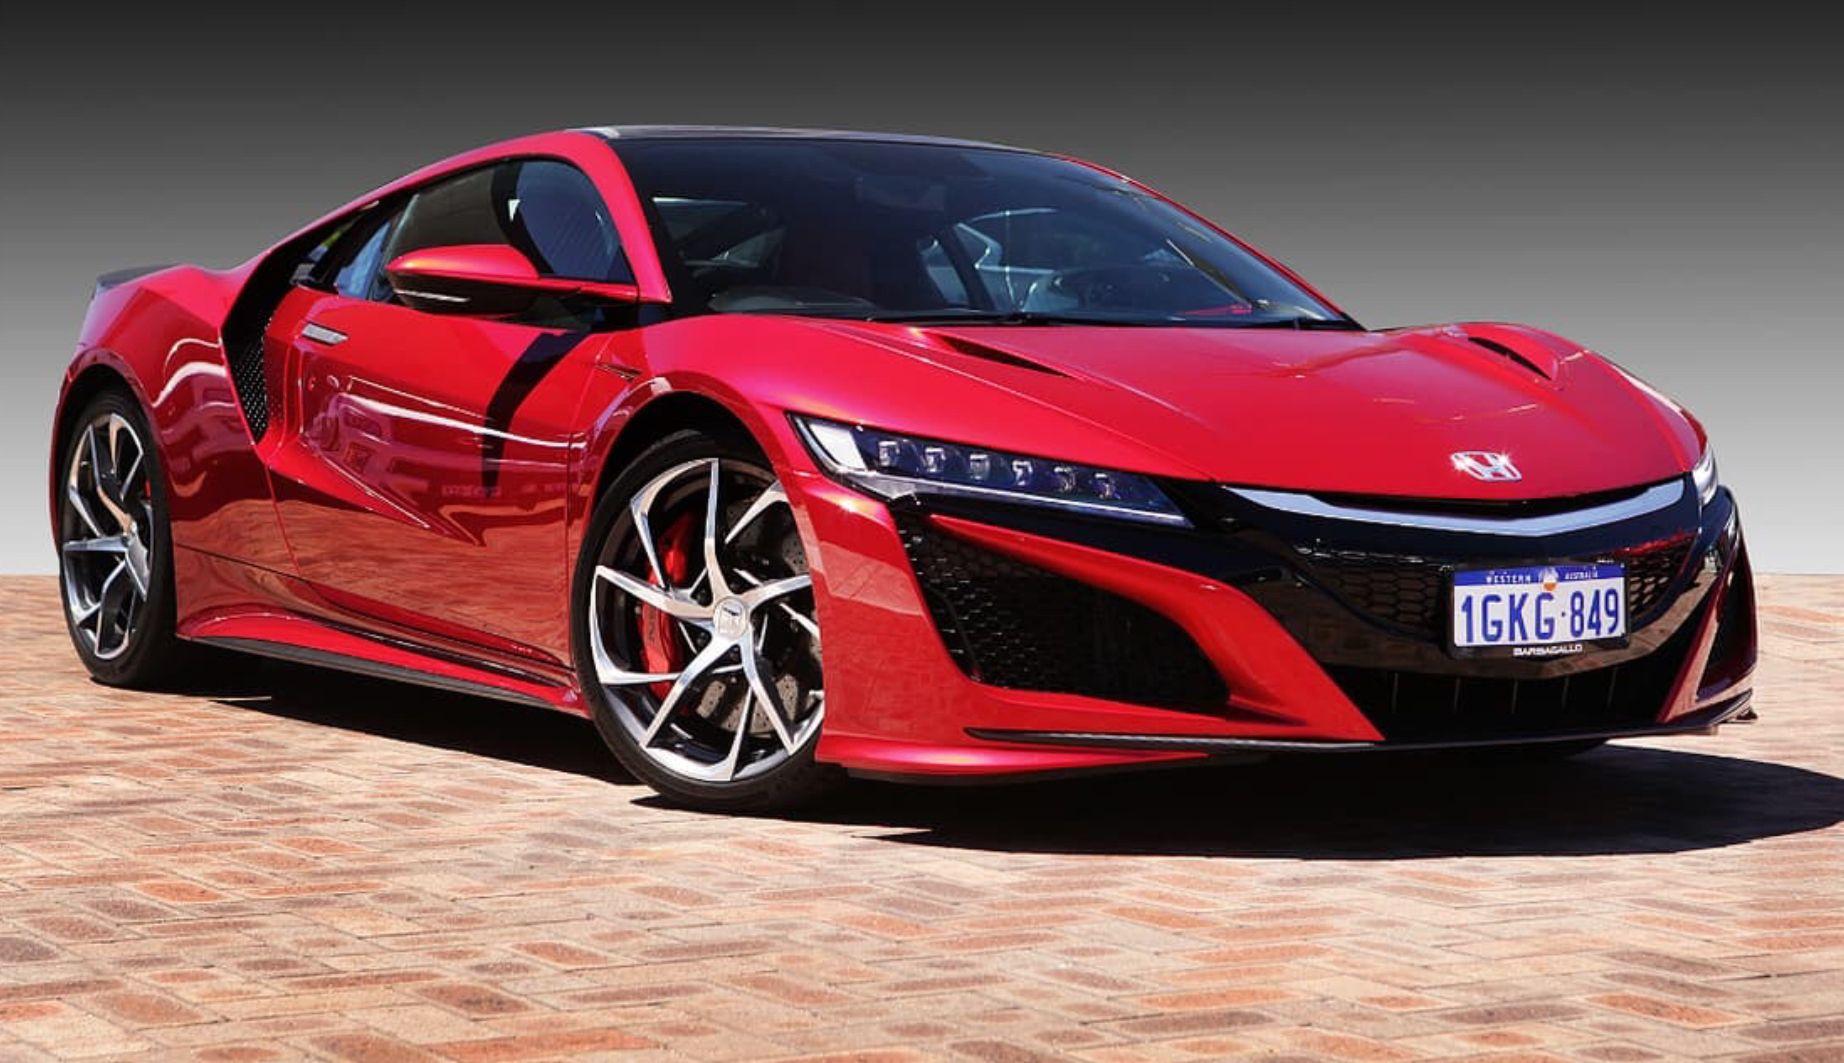 Honda NSX 2018 | Sports cars luxury, Nsx, Honda